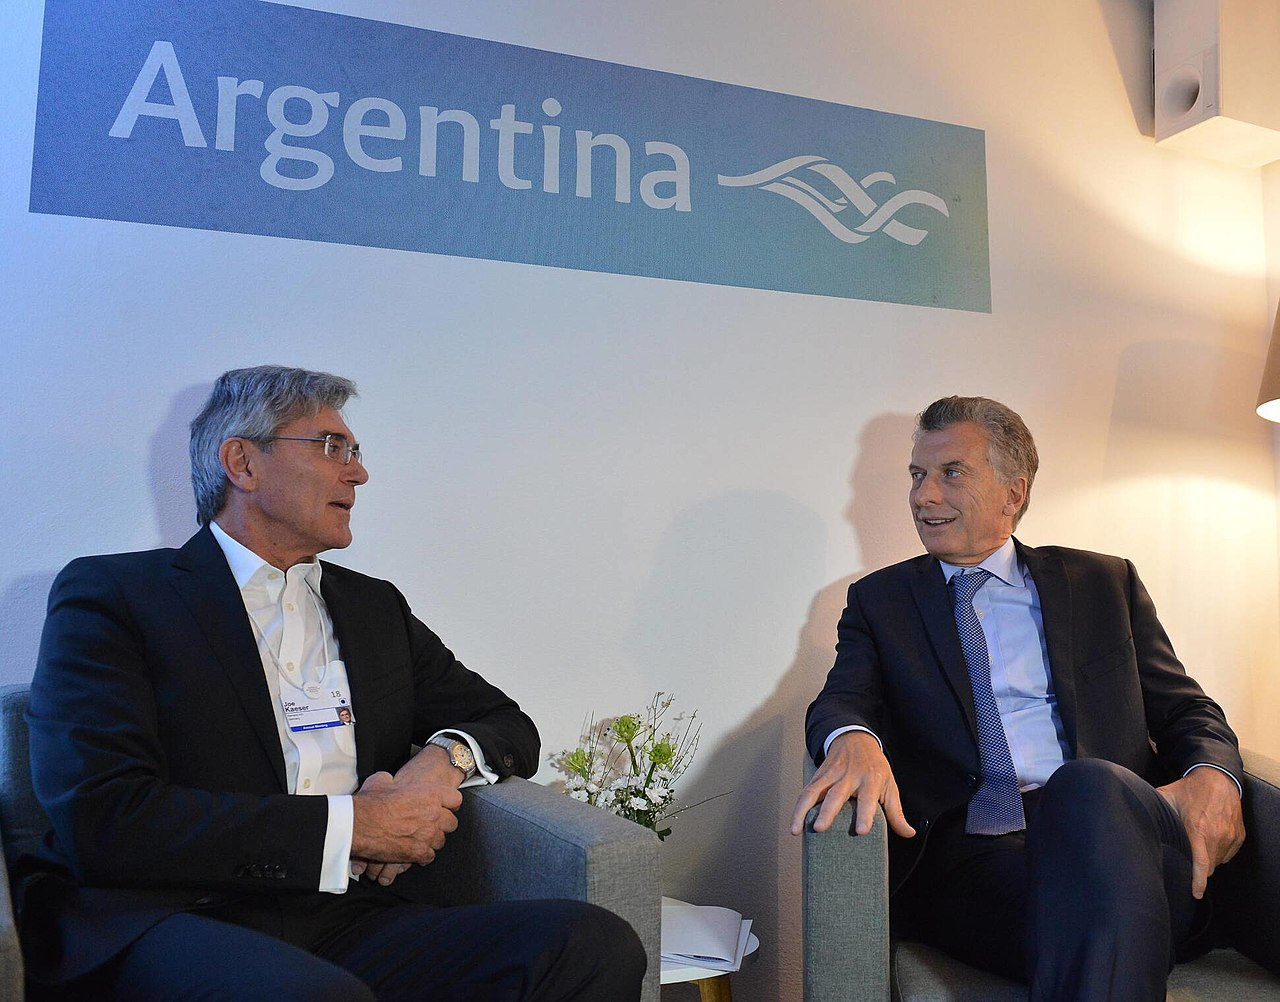 Mauricio Macri & Joe Kaeser Davos 2018.jpg